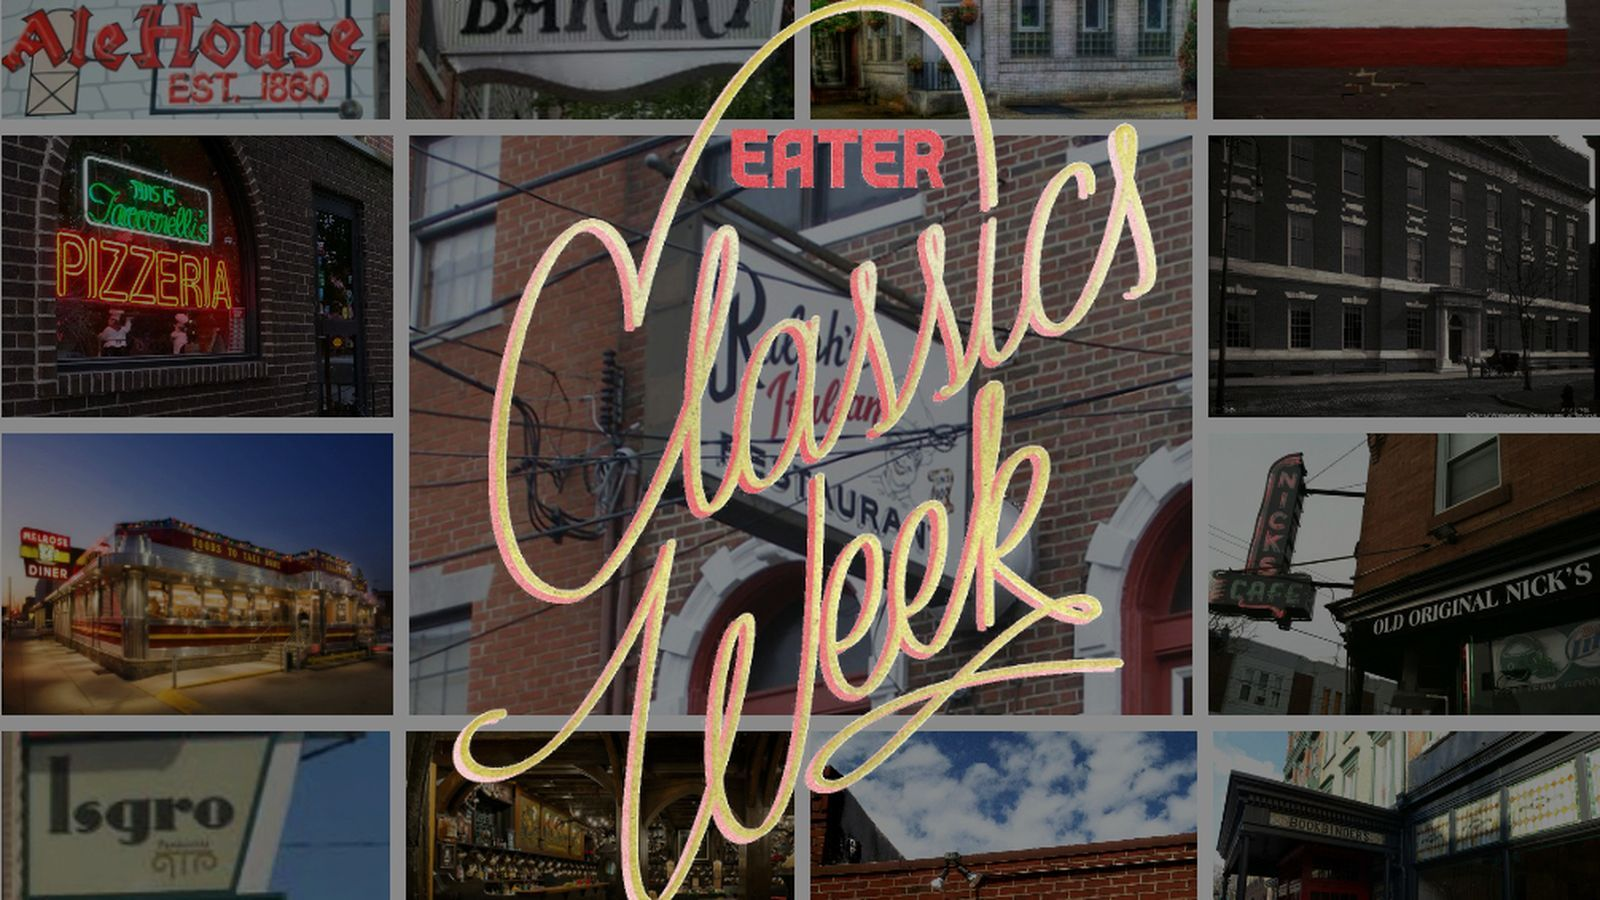 18 Classic Restaurants Every Philadelphian Must Try